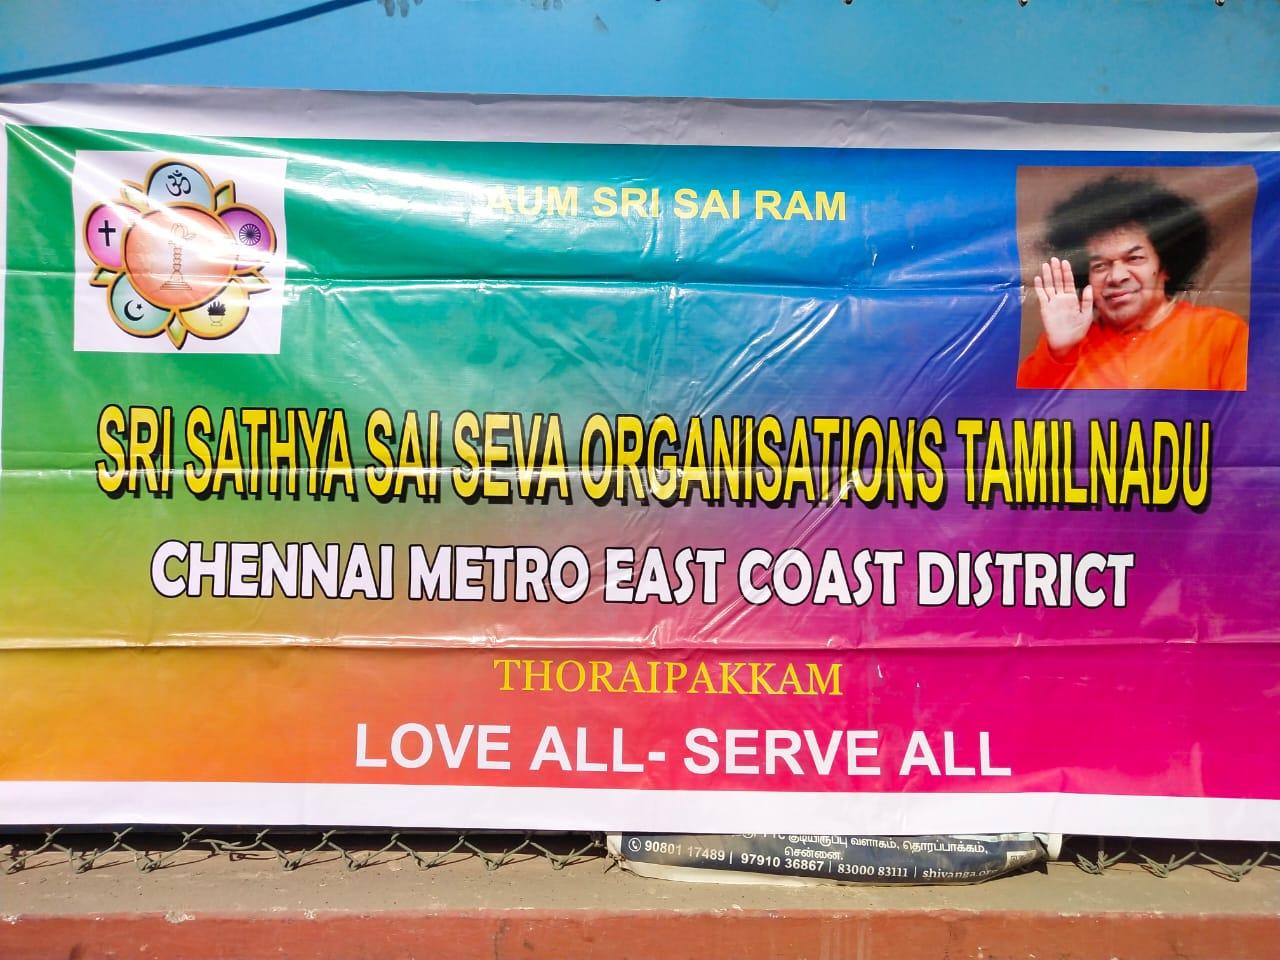 Inauguration of Sri Satha Sai Seva Samithi, Thoraipakkam, Chennai Metro East Coast